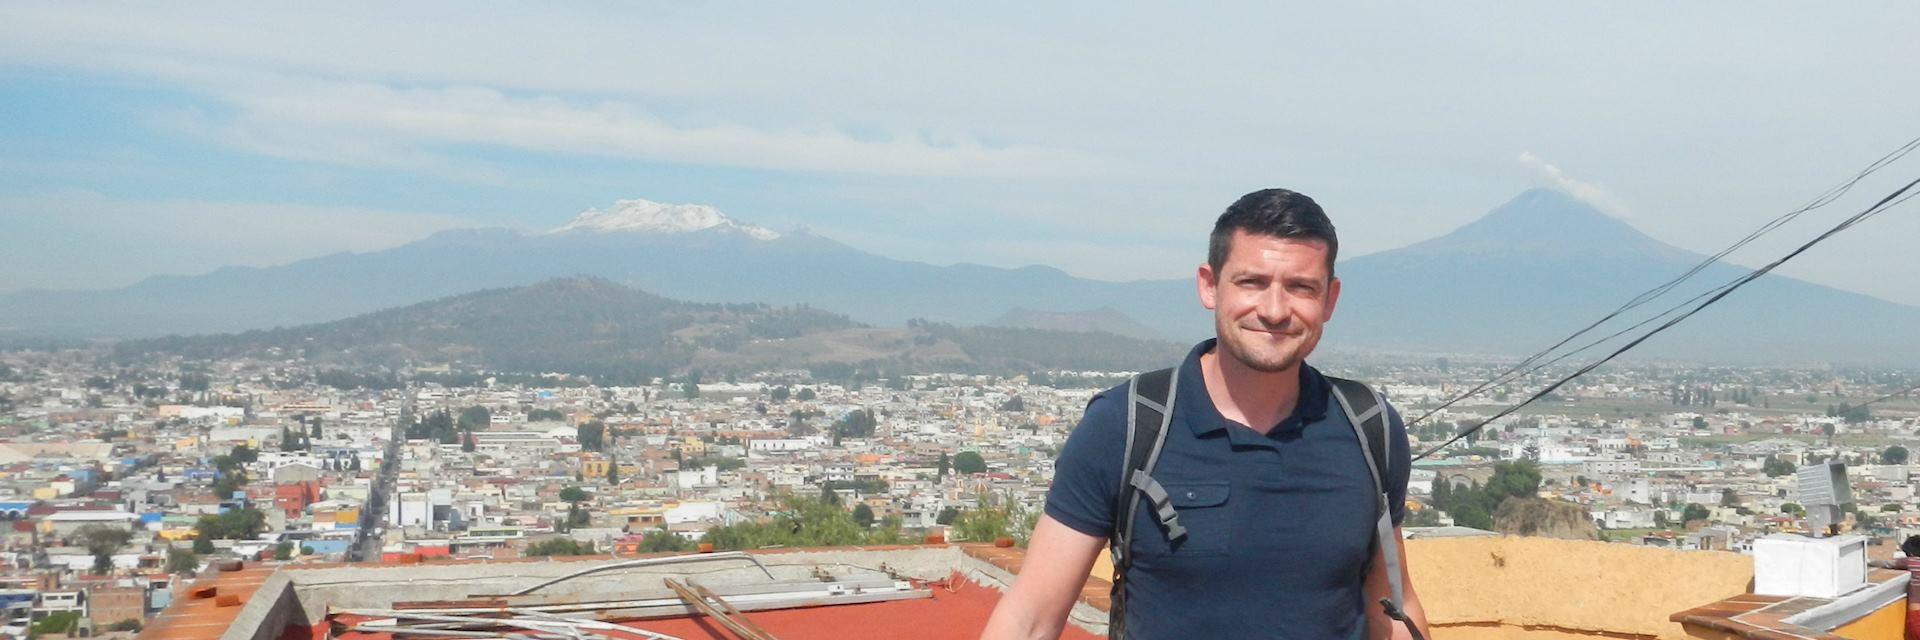 Latin America specialist Chris in Popocatepetl, Mexico